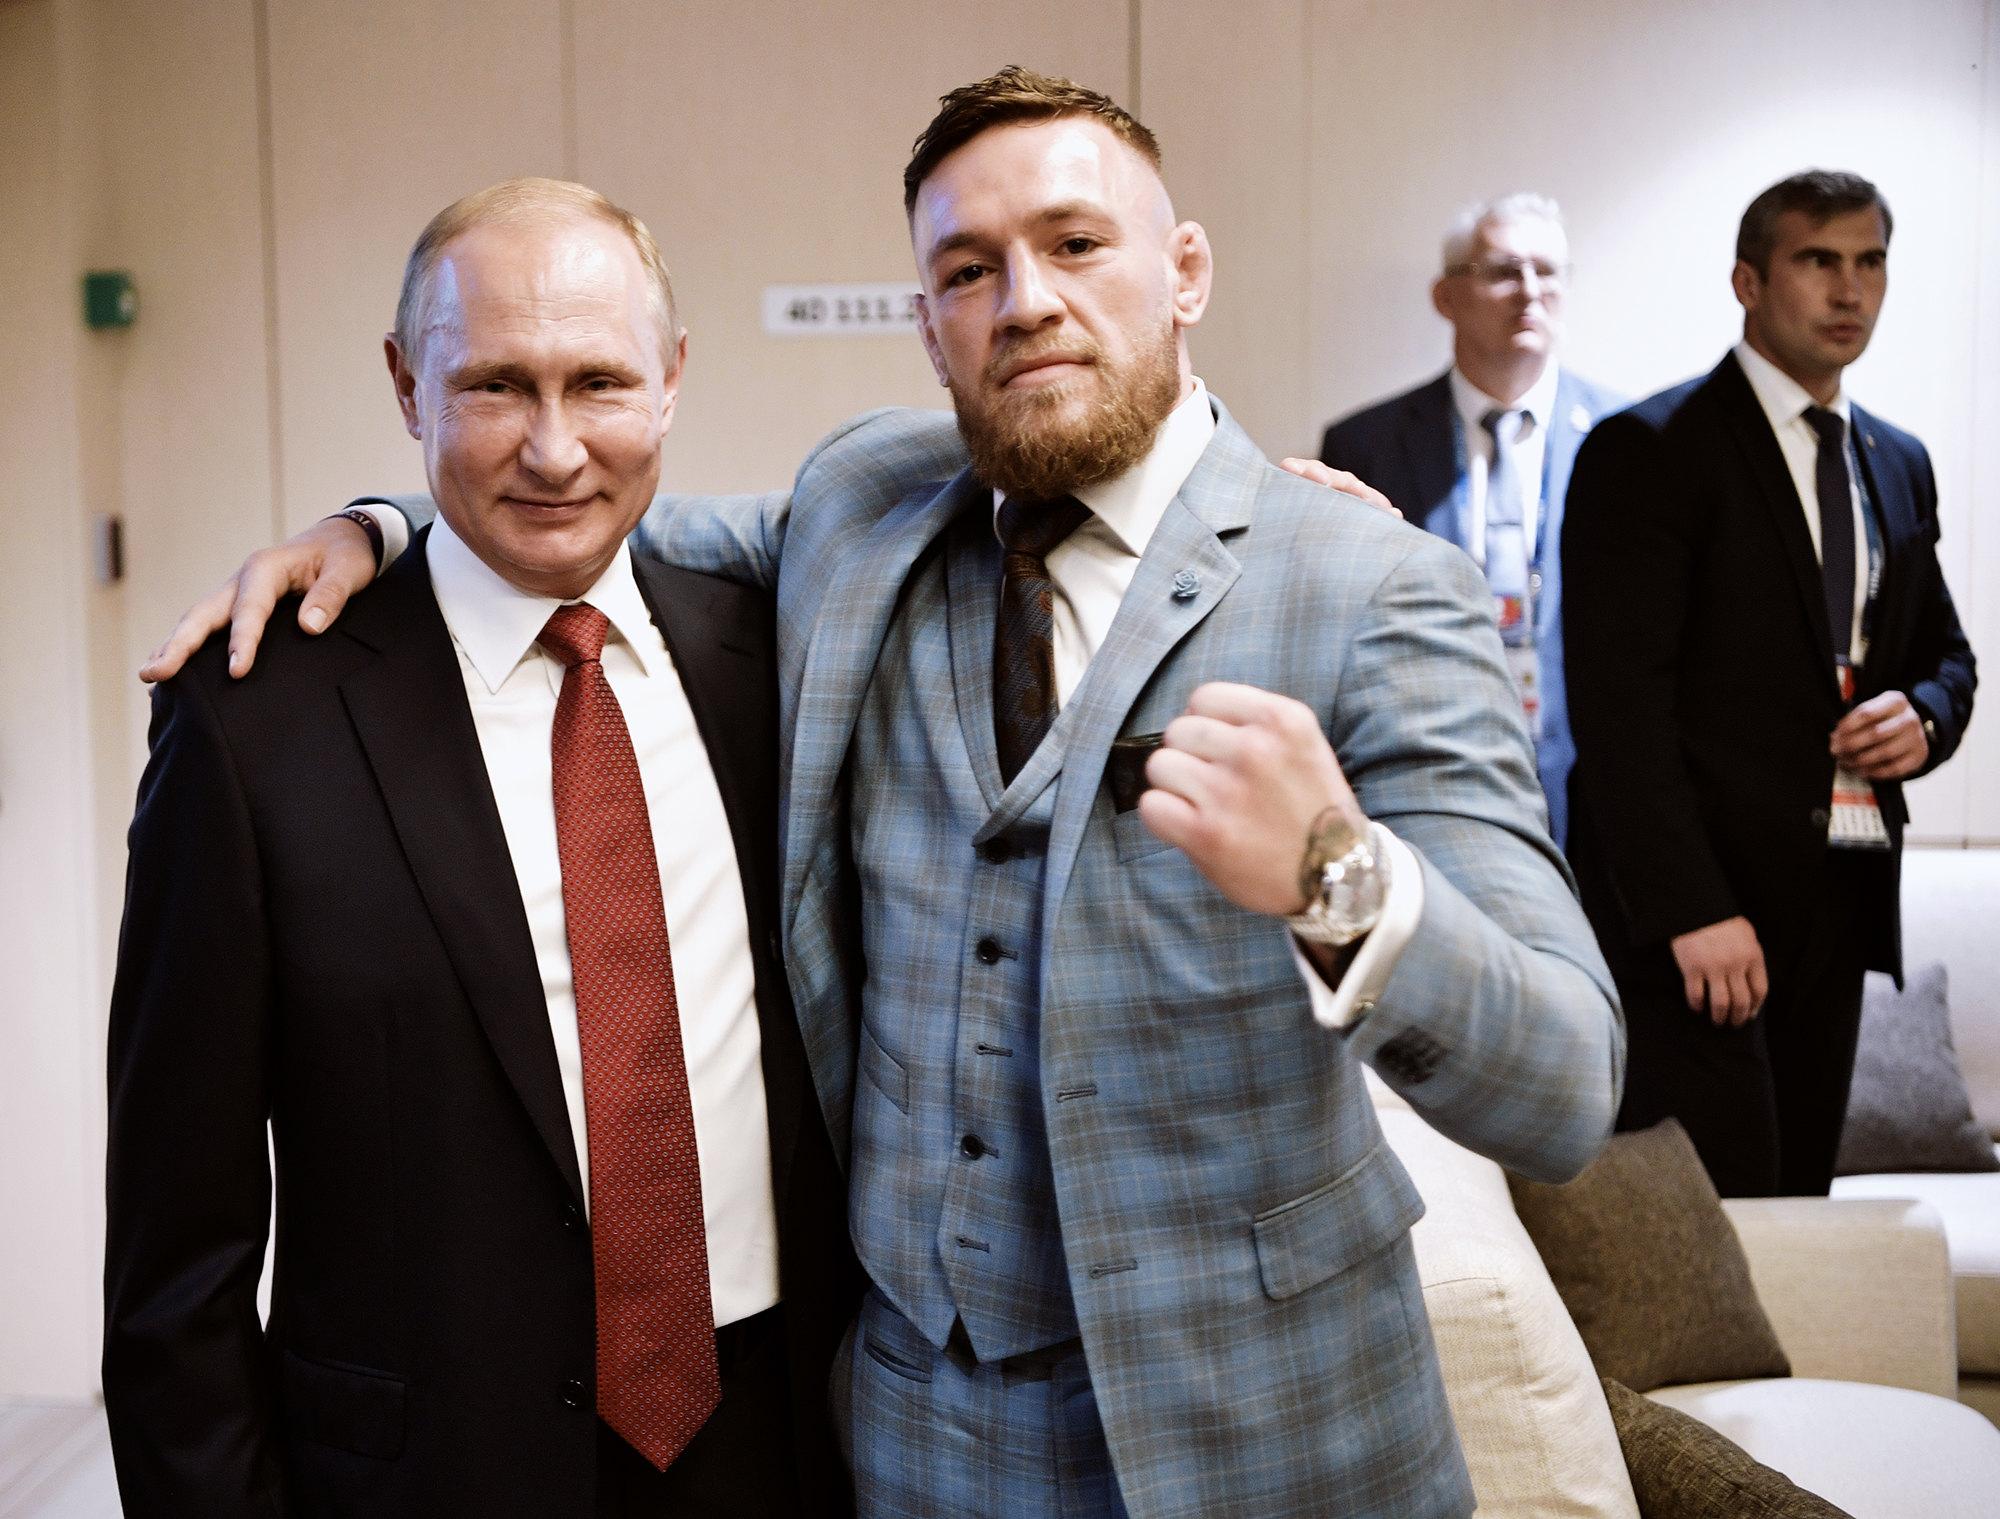 Конор Макгрегор иВладимир Путин во время матча между Францией иХорватией вфинале чемпионата мира пофутболу, 2018 год, Москва